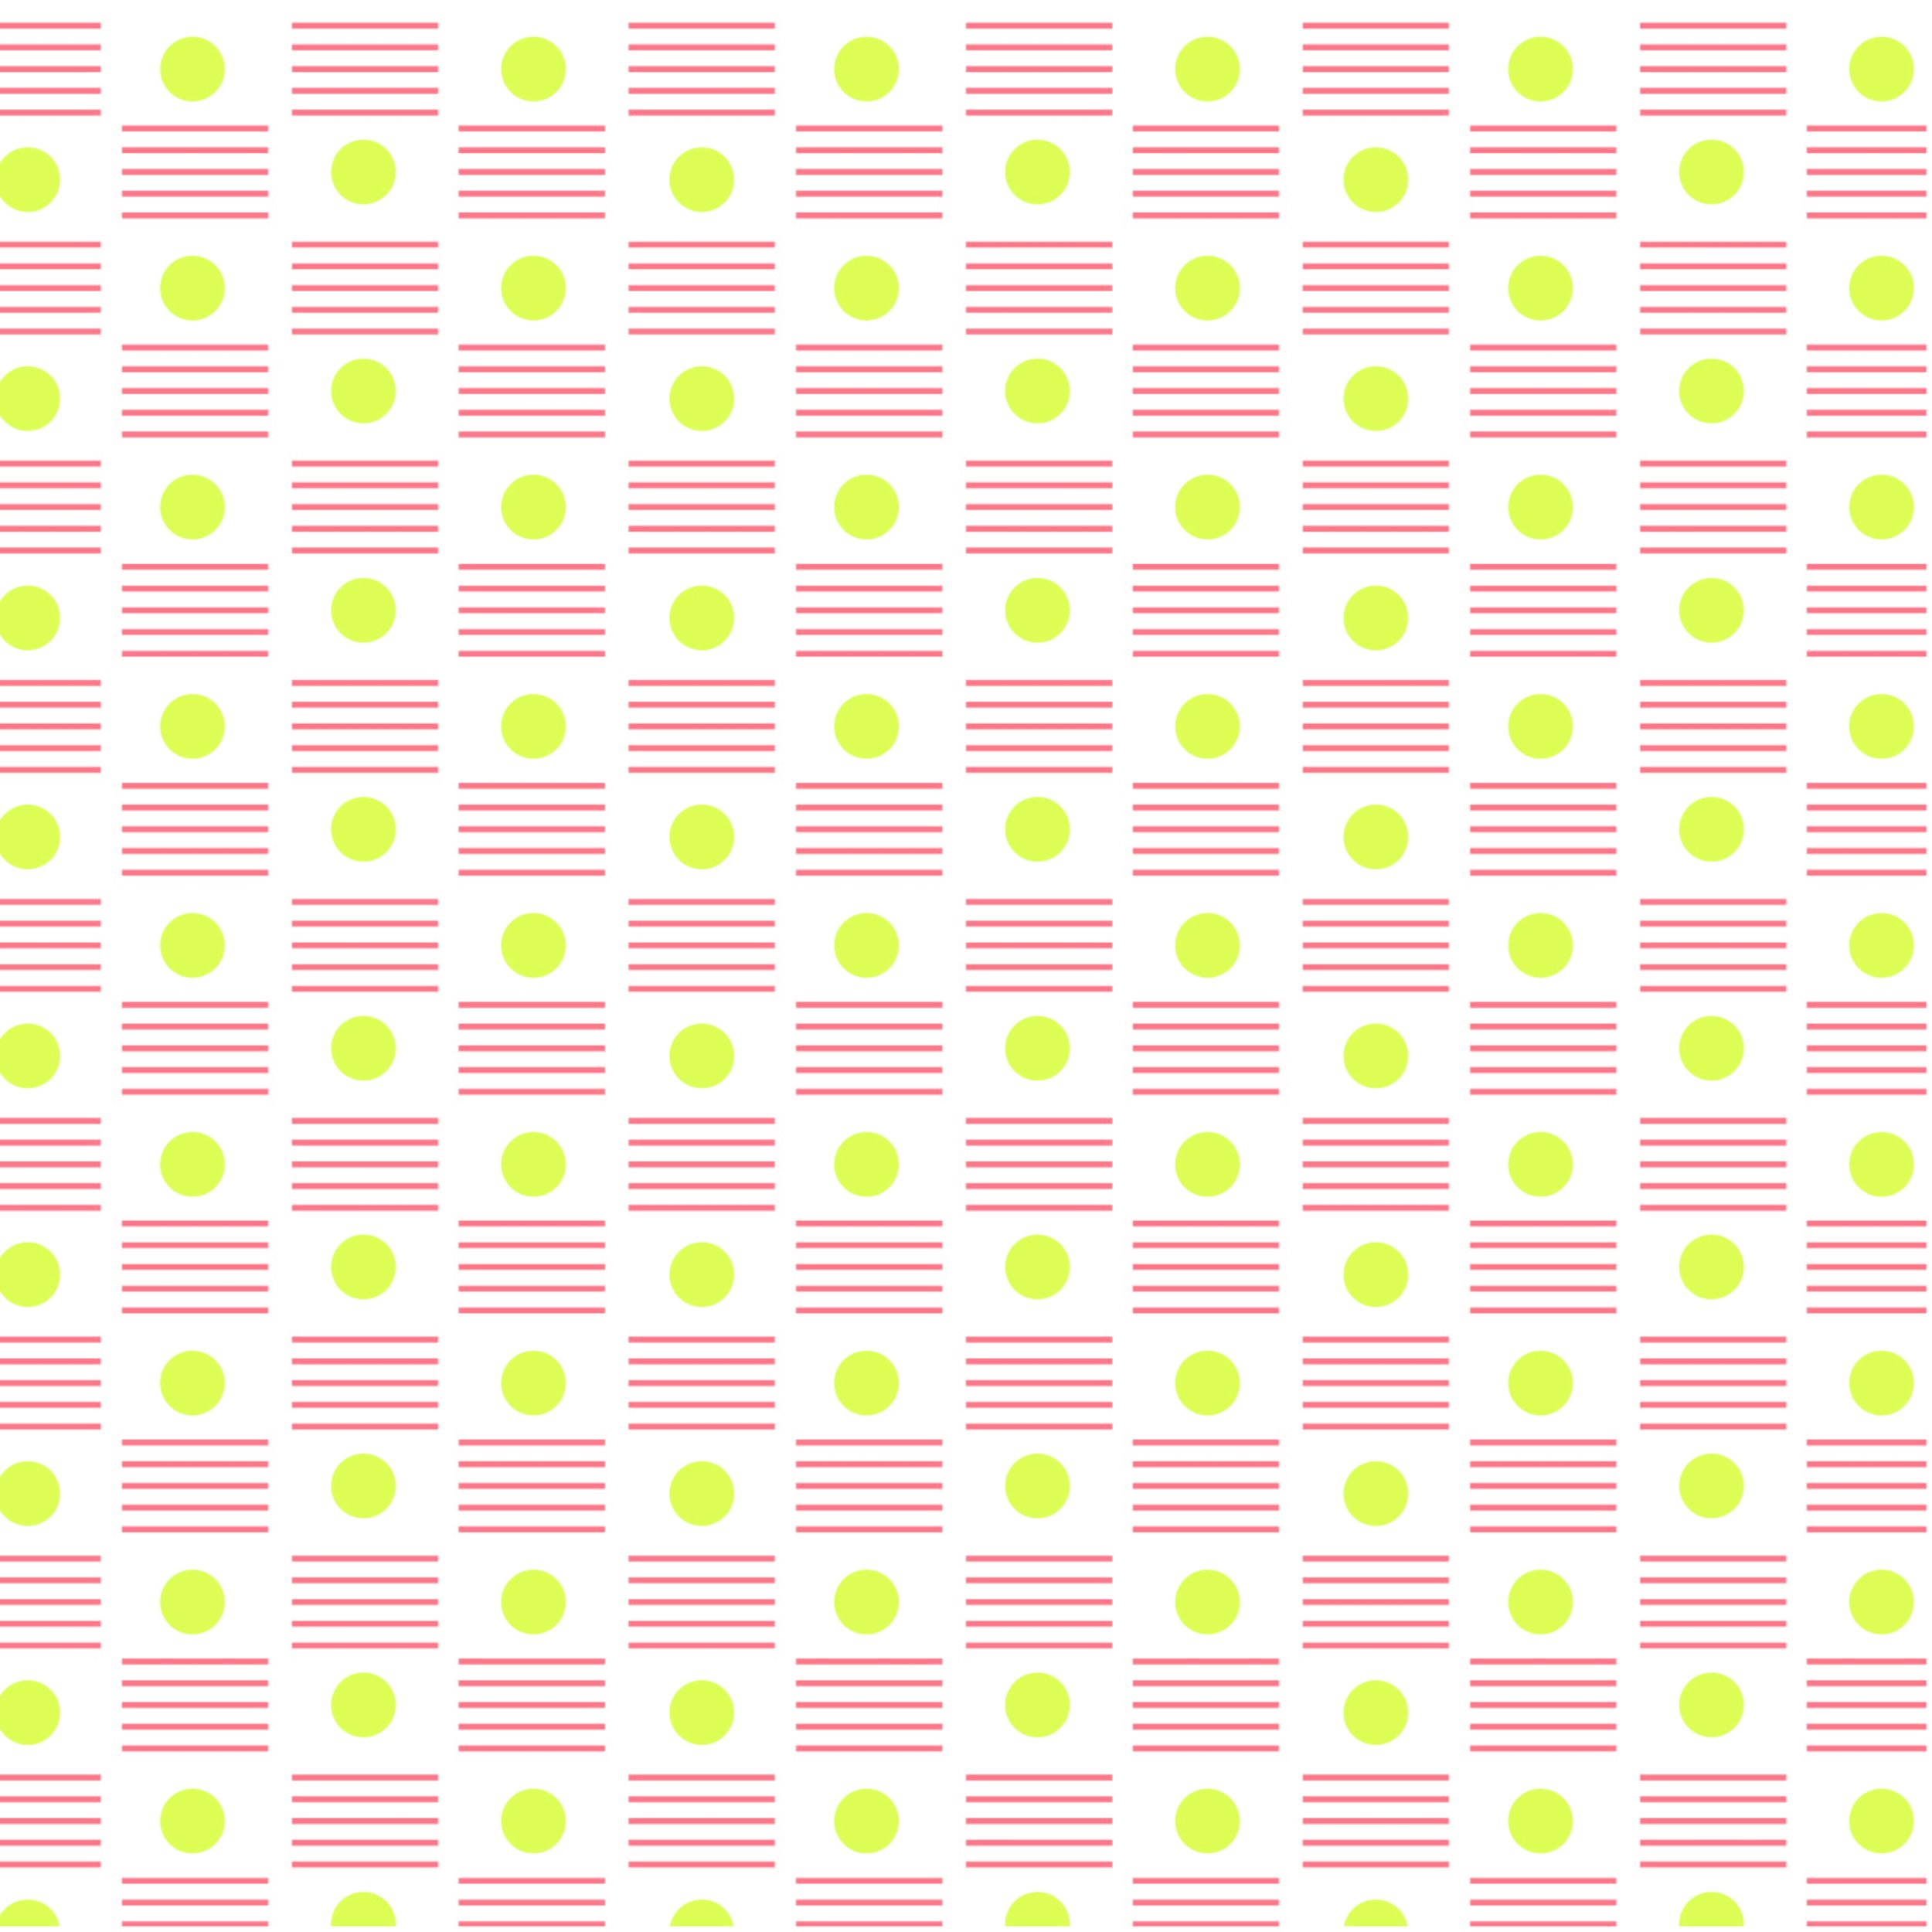 patterns for texas-19.jpg